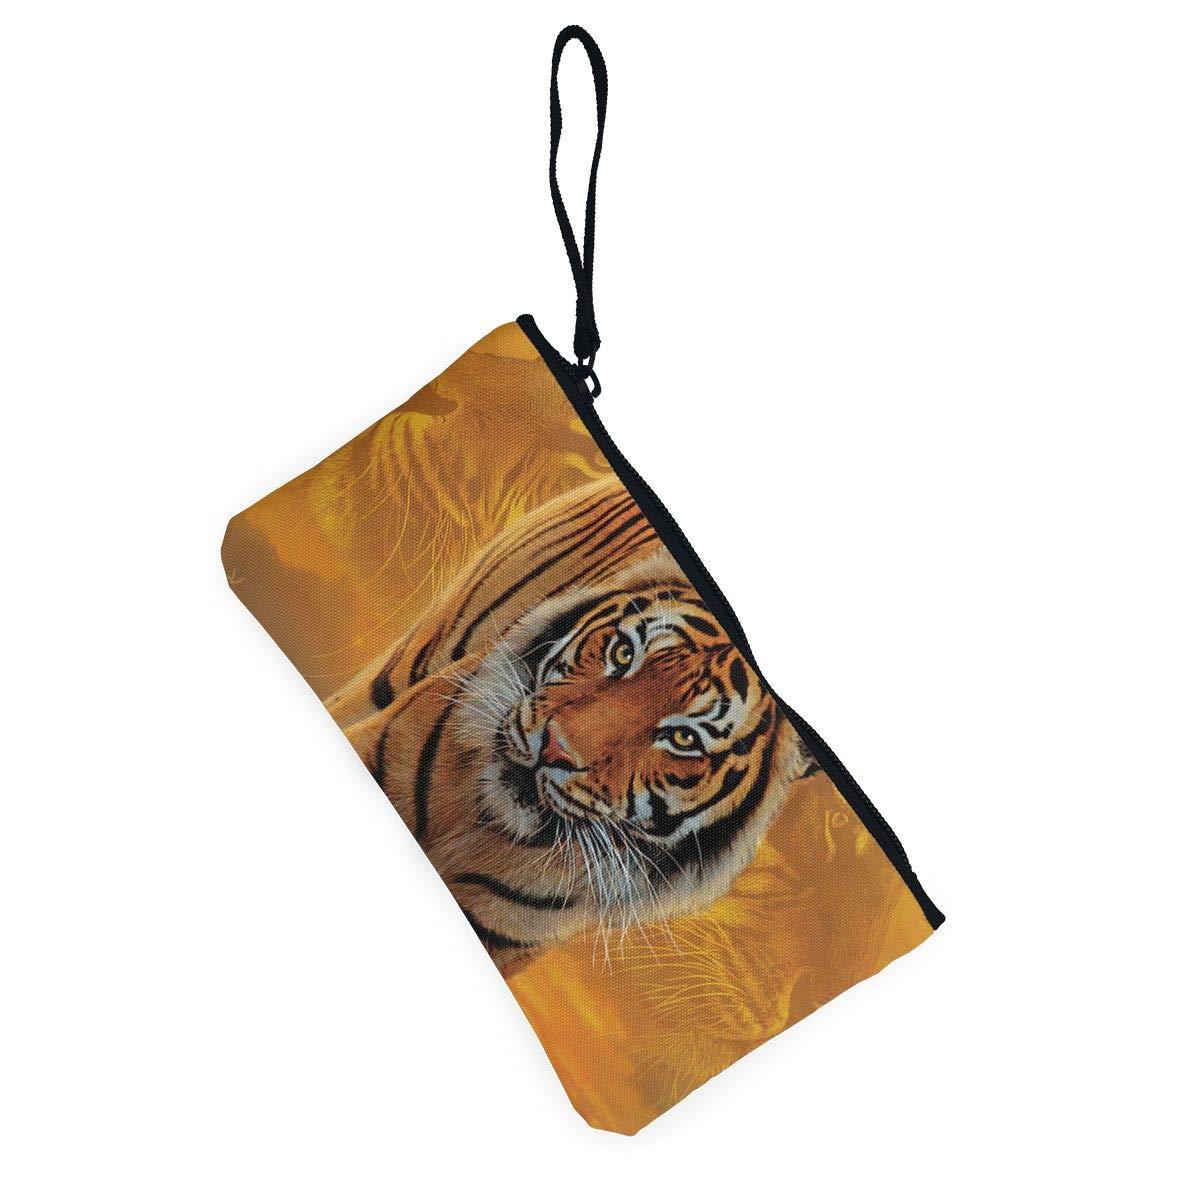 Canvas Cash Coin Purse,Rising Sun Tiger Print Make Up Bag Zipper Small Purse Wallets